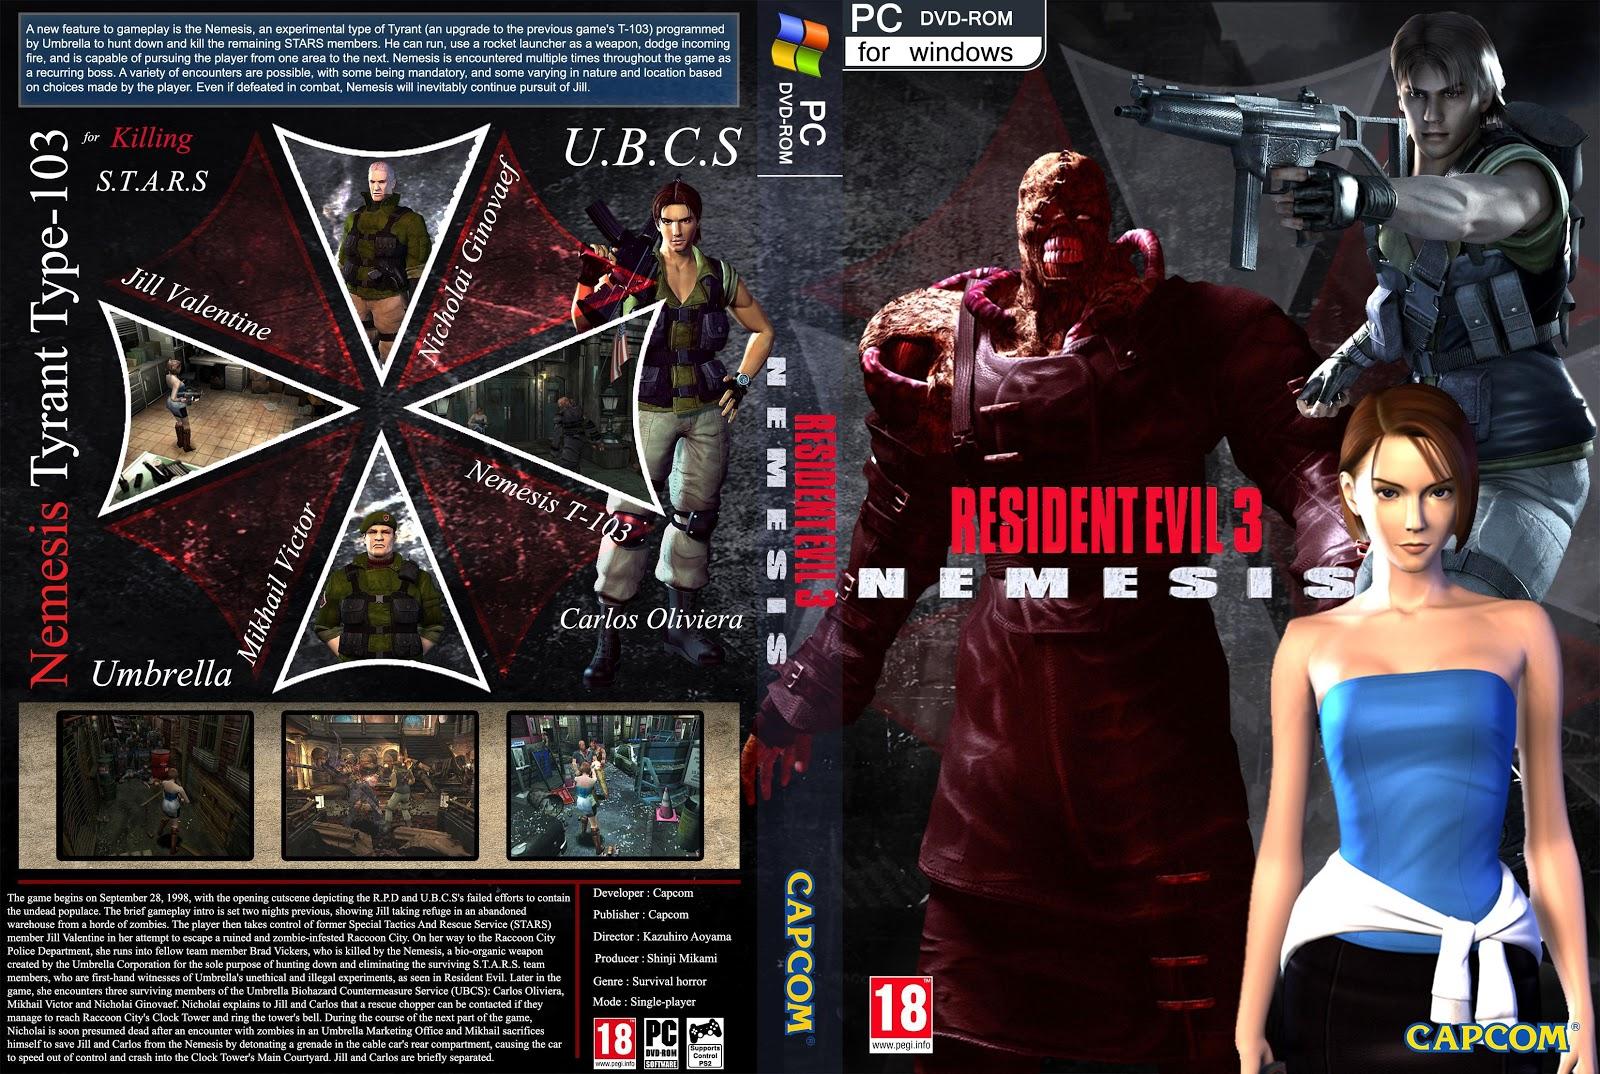 Capa Resident Evil 3 Nemesis PC